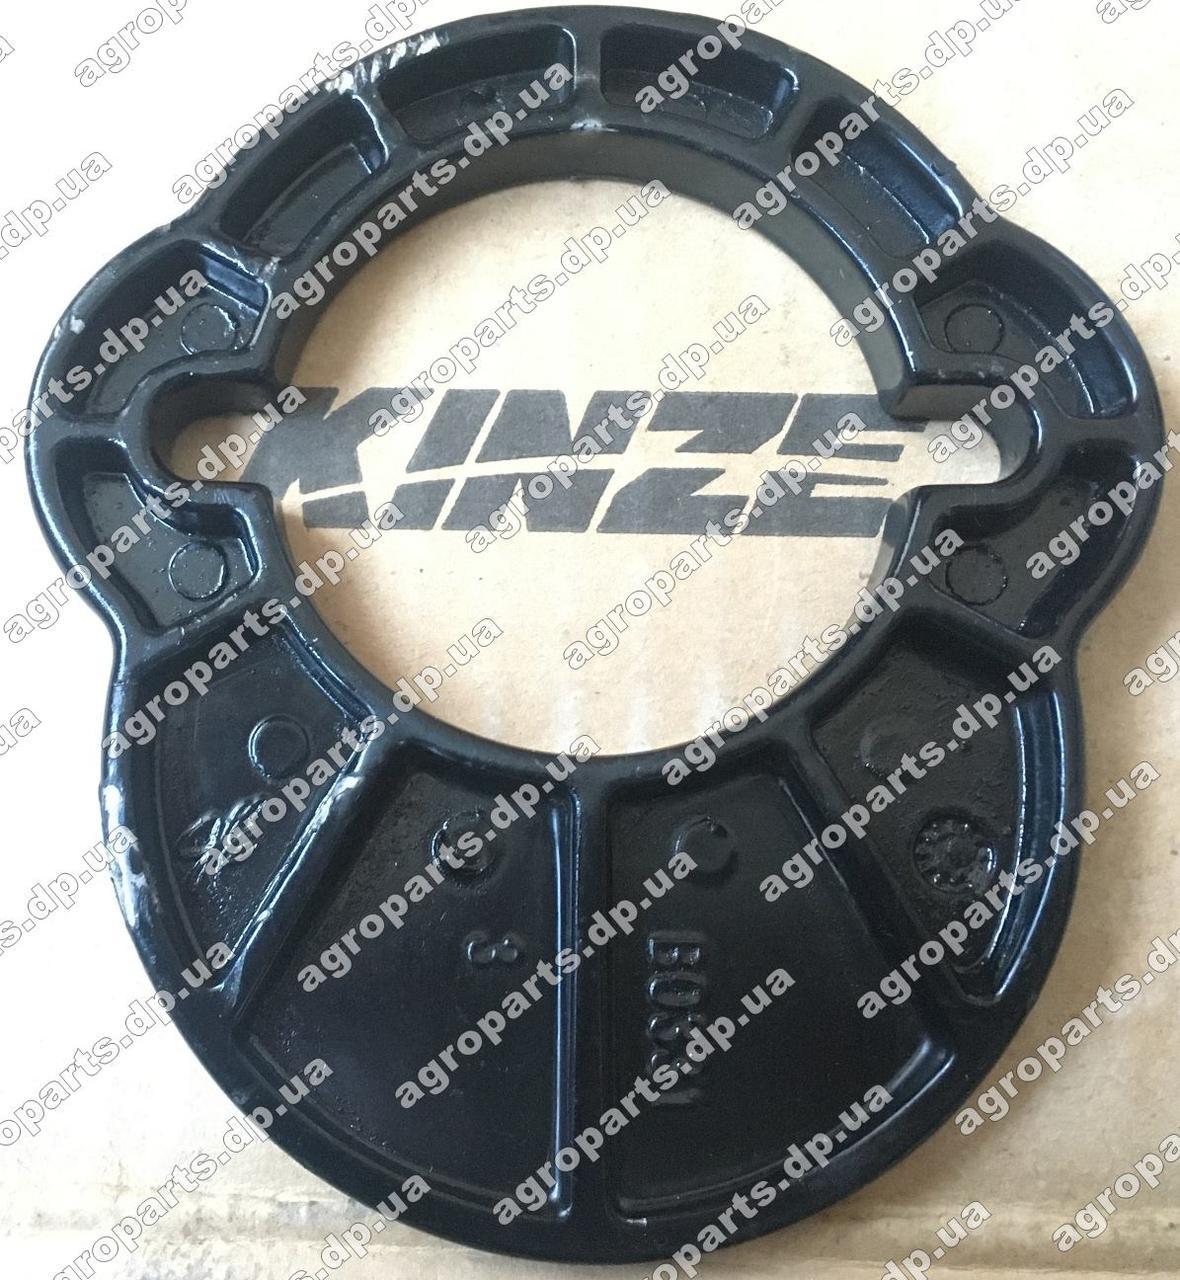 Пластина GB0331 адаптор Kinze Clutch Adapter Plate шайба В0331